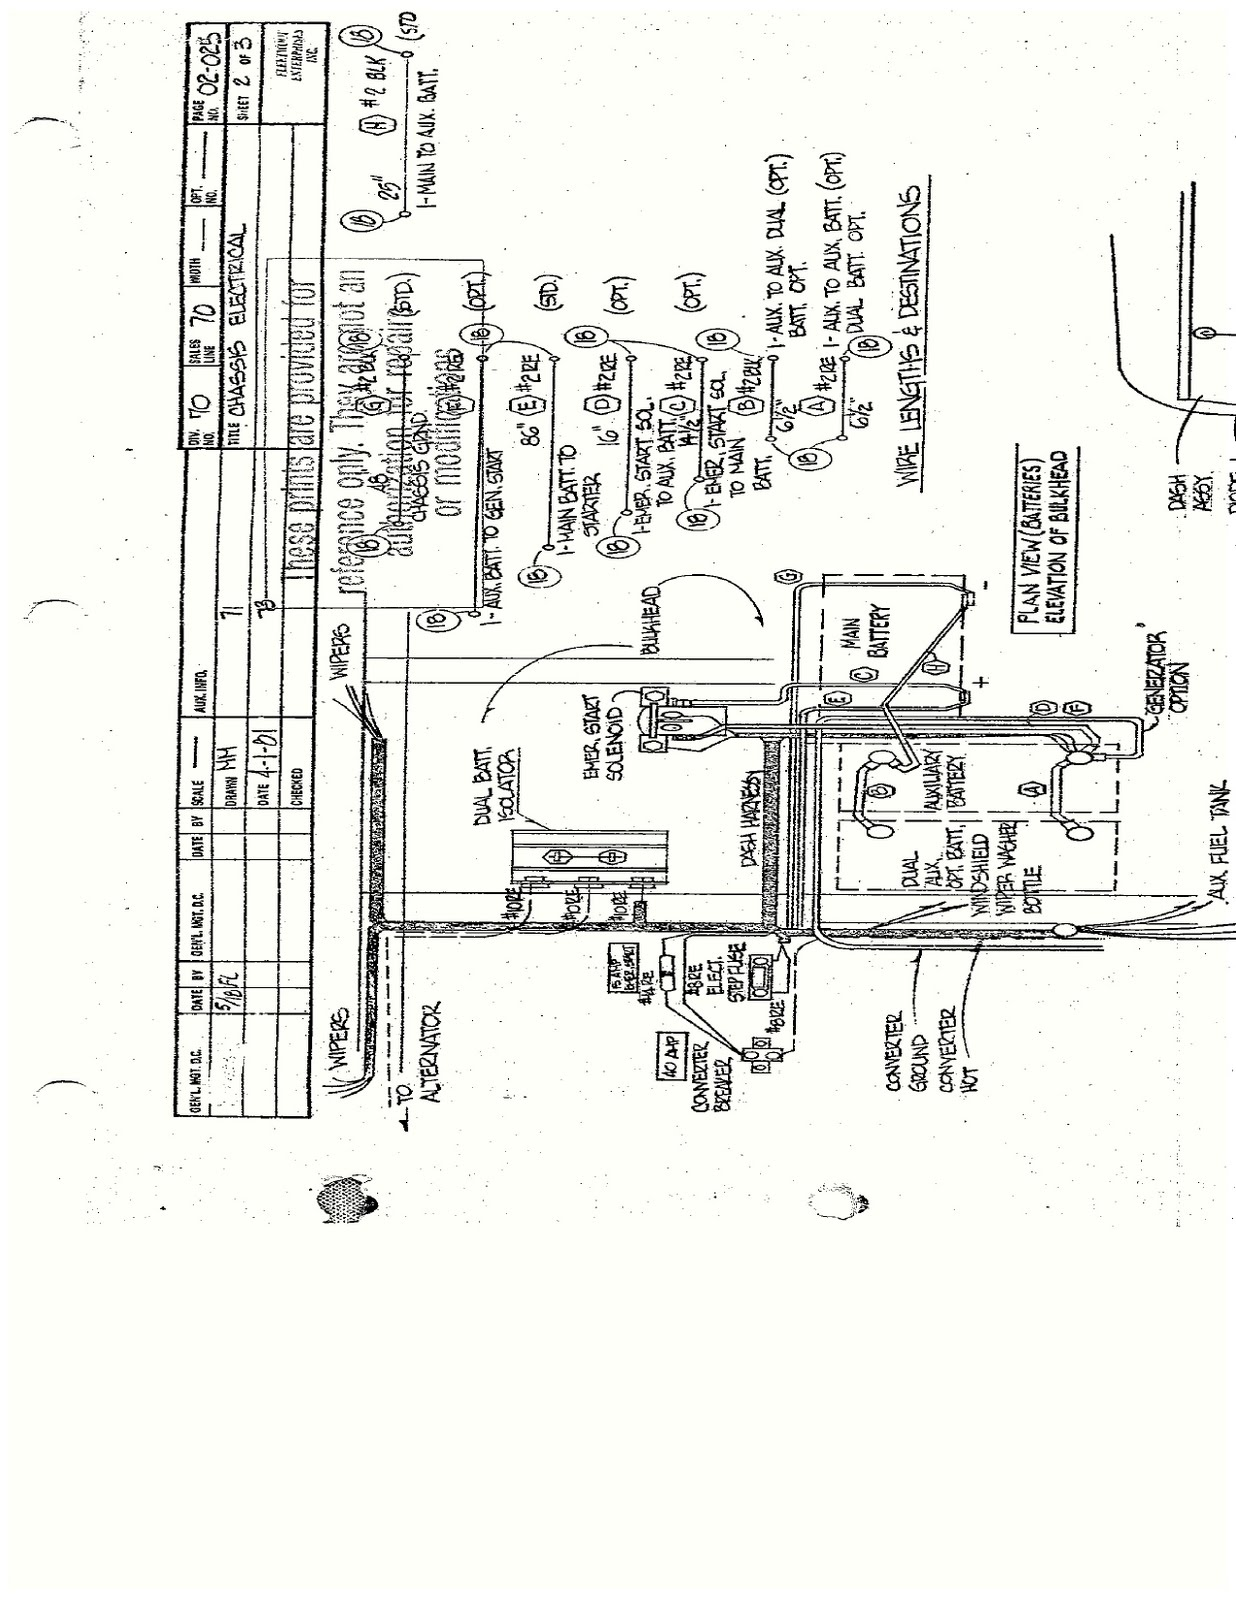 fleetwood rv wiring diagrams 1983 ford f150 alternator diagram chevy